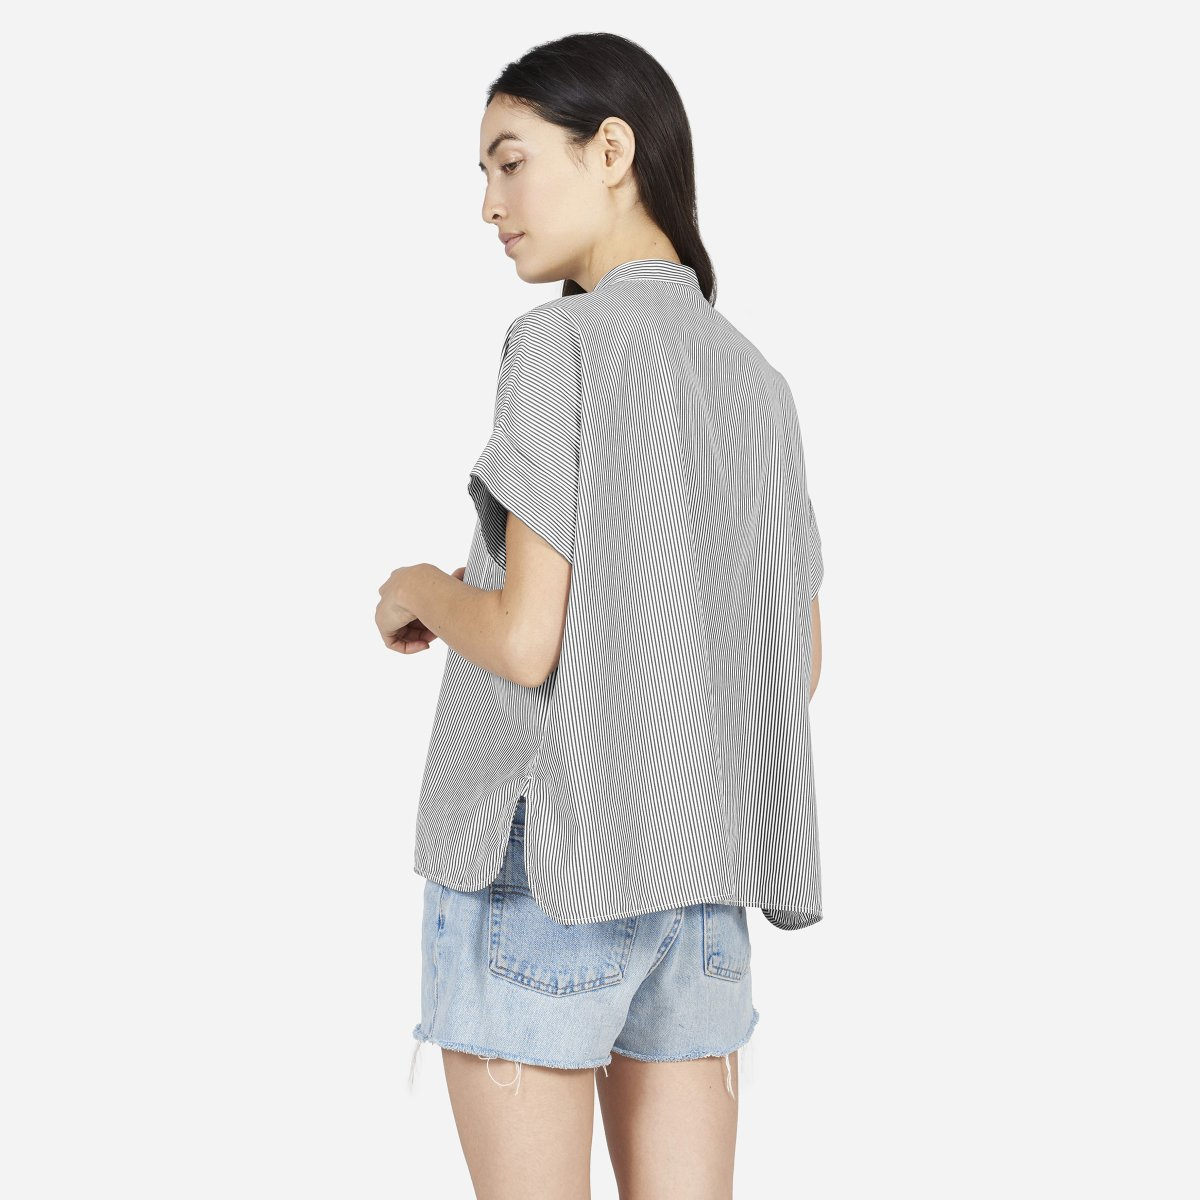 68042976ecb131 Women's Cotton Poplin Collarless Short-Sleeve Square Shirt | Everlane